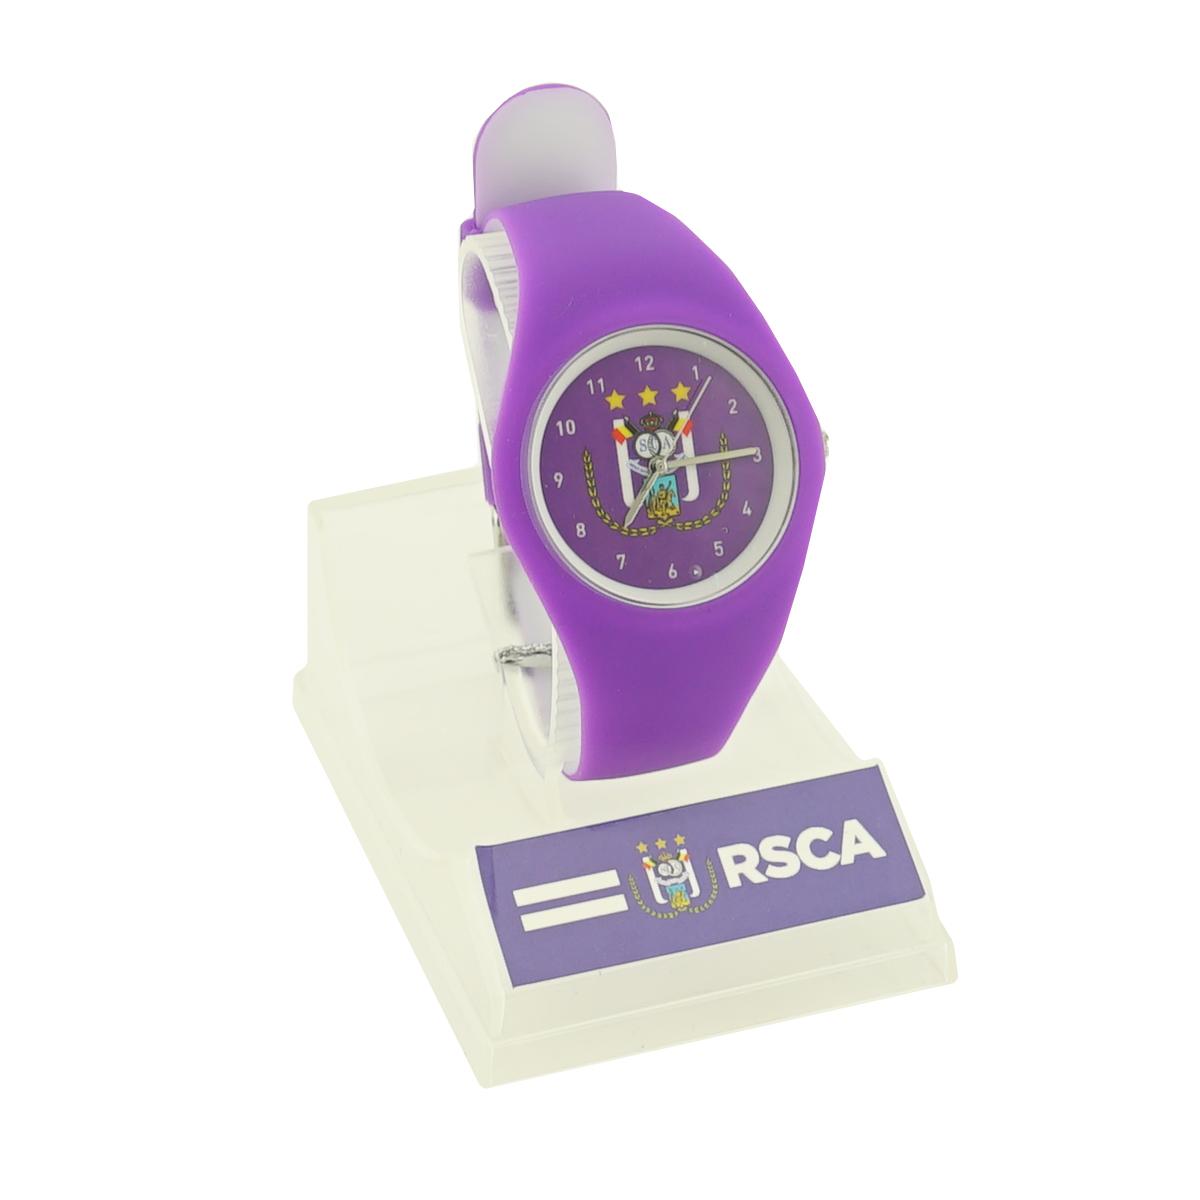 RSCA Horloge Silicoon